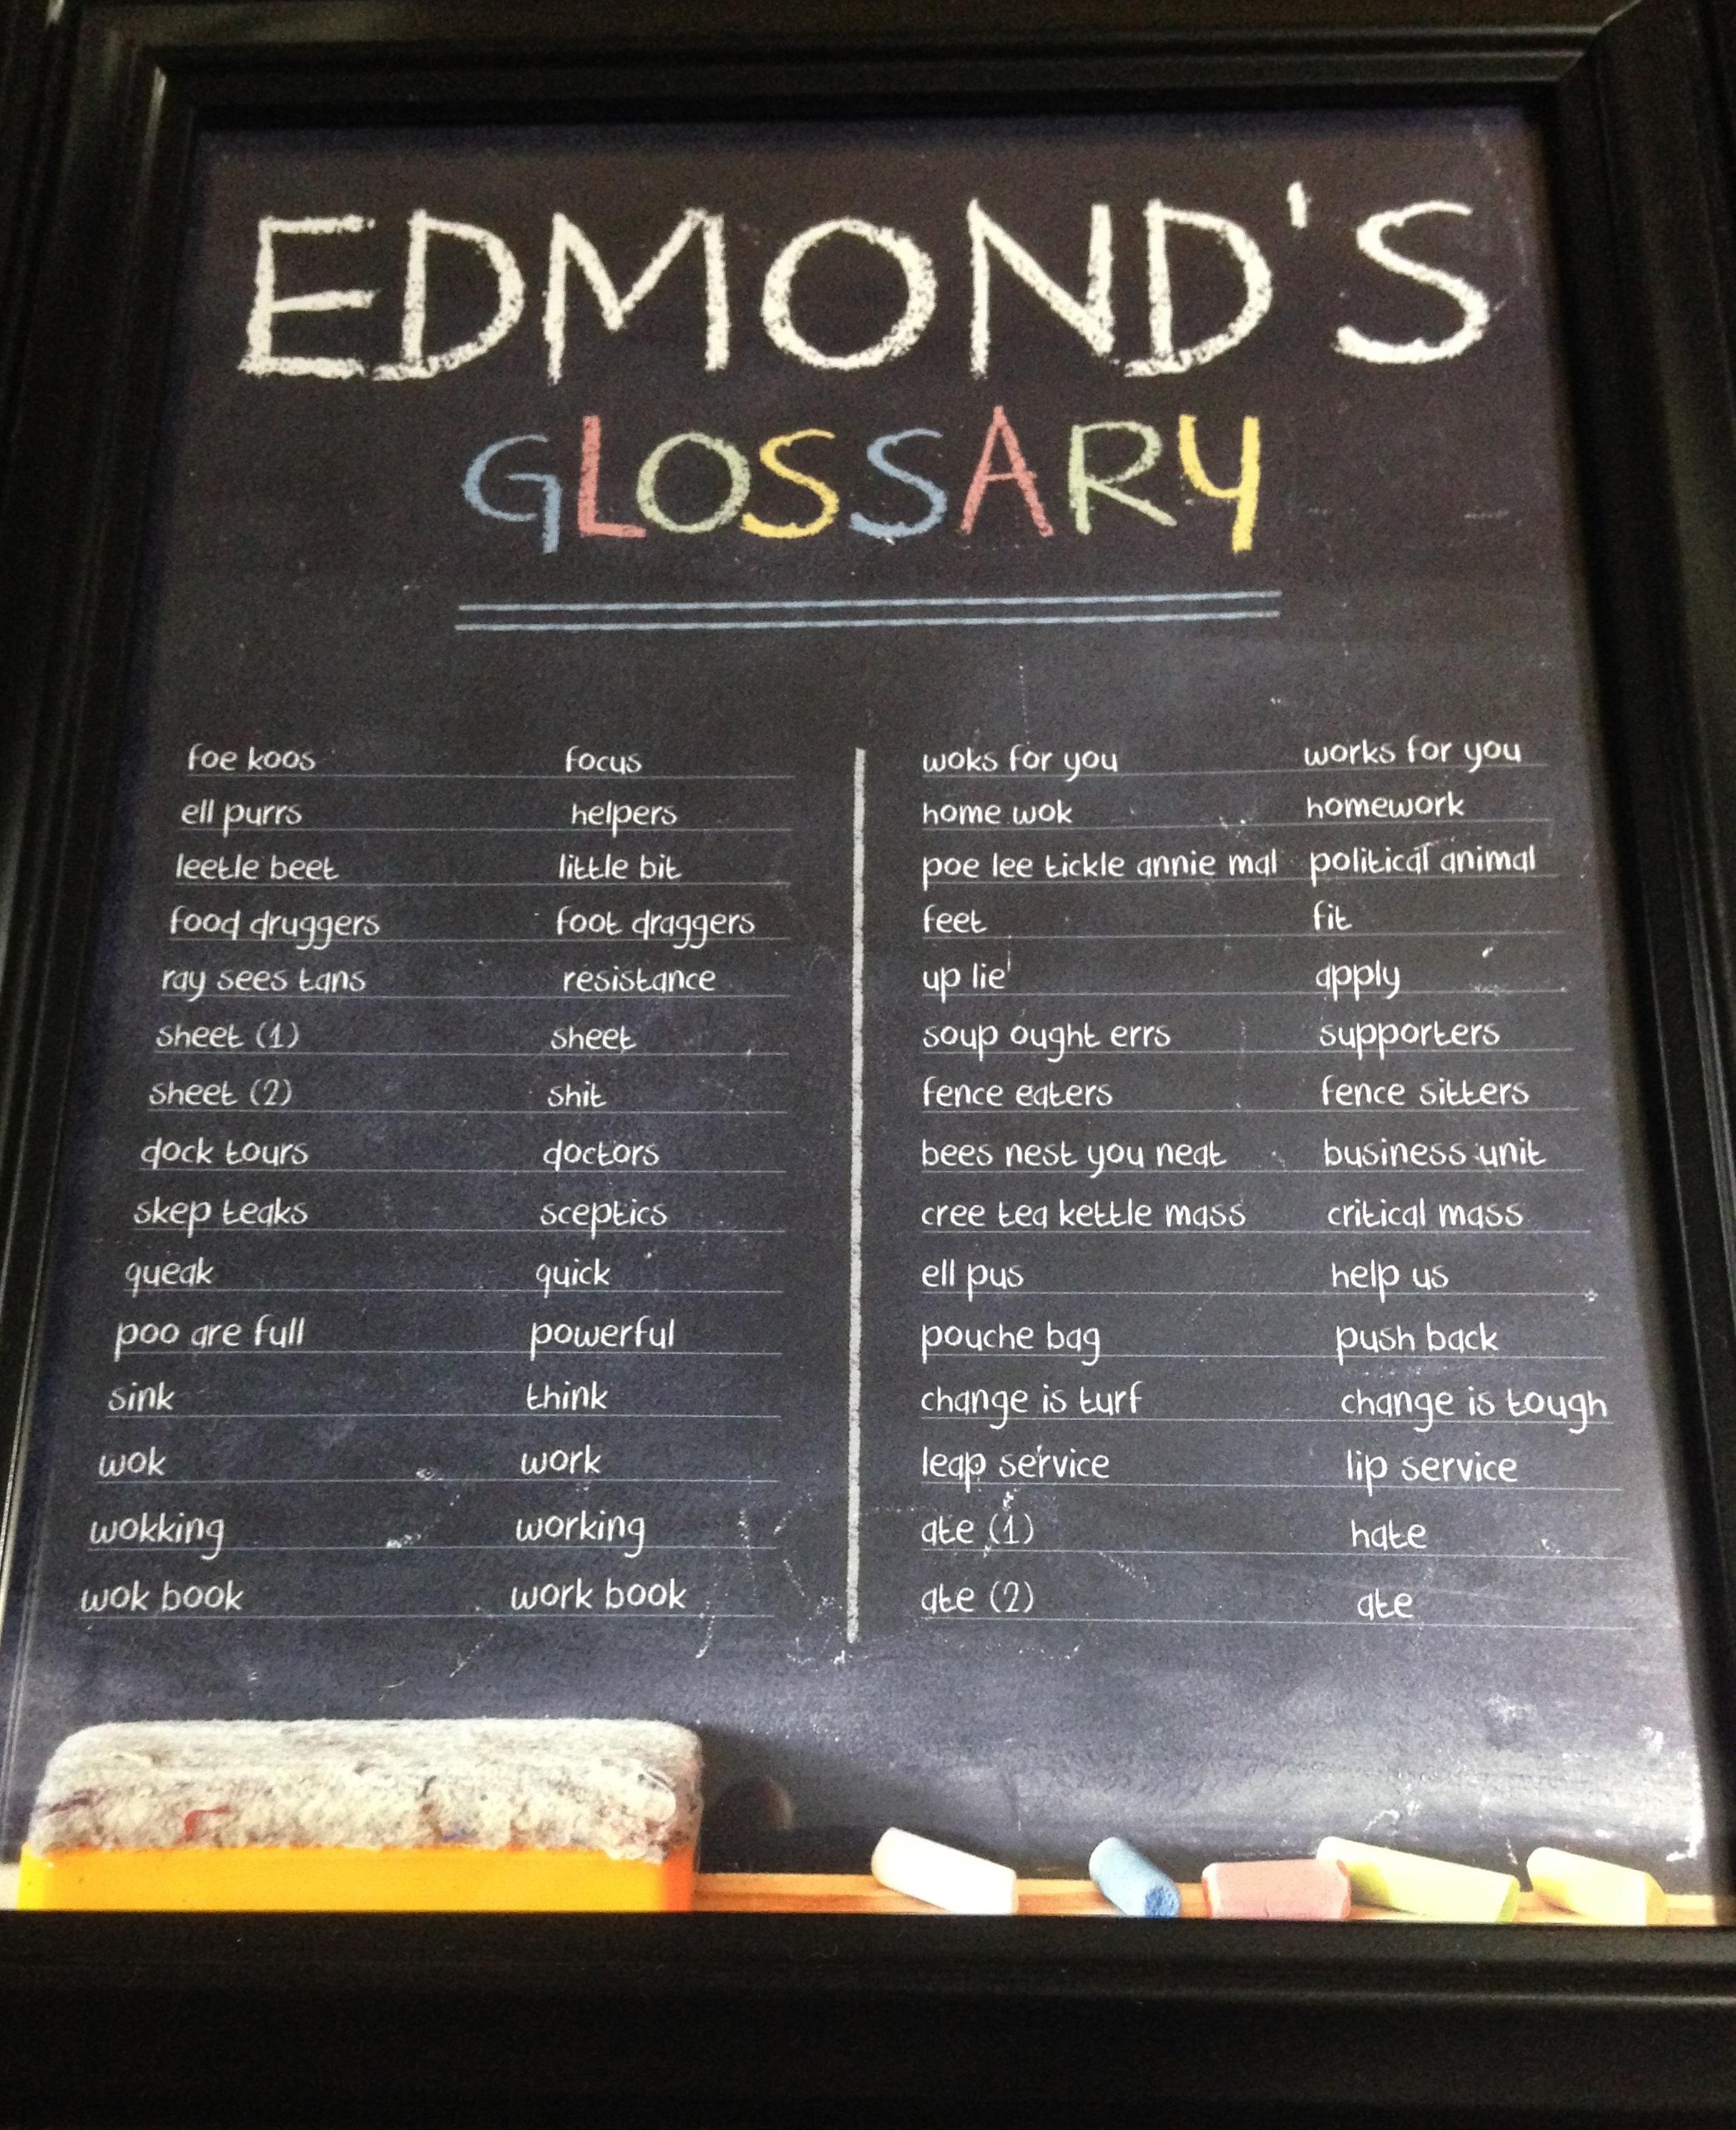 Edmond's Glossary ;-)